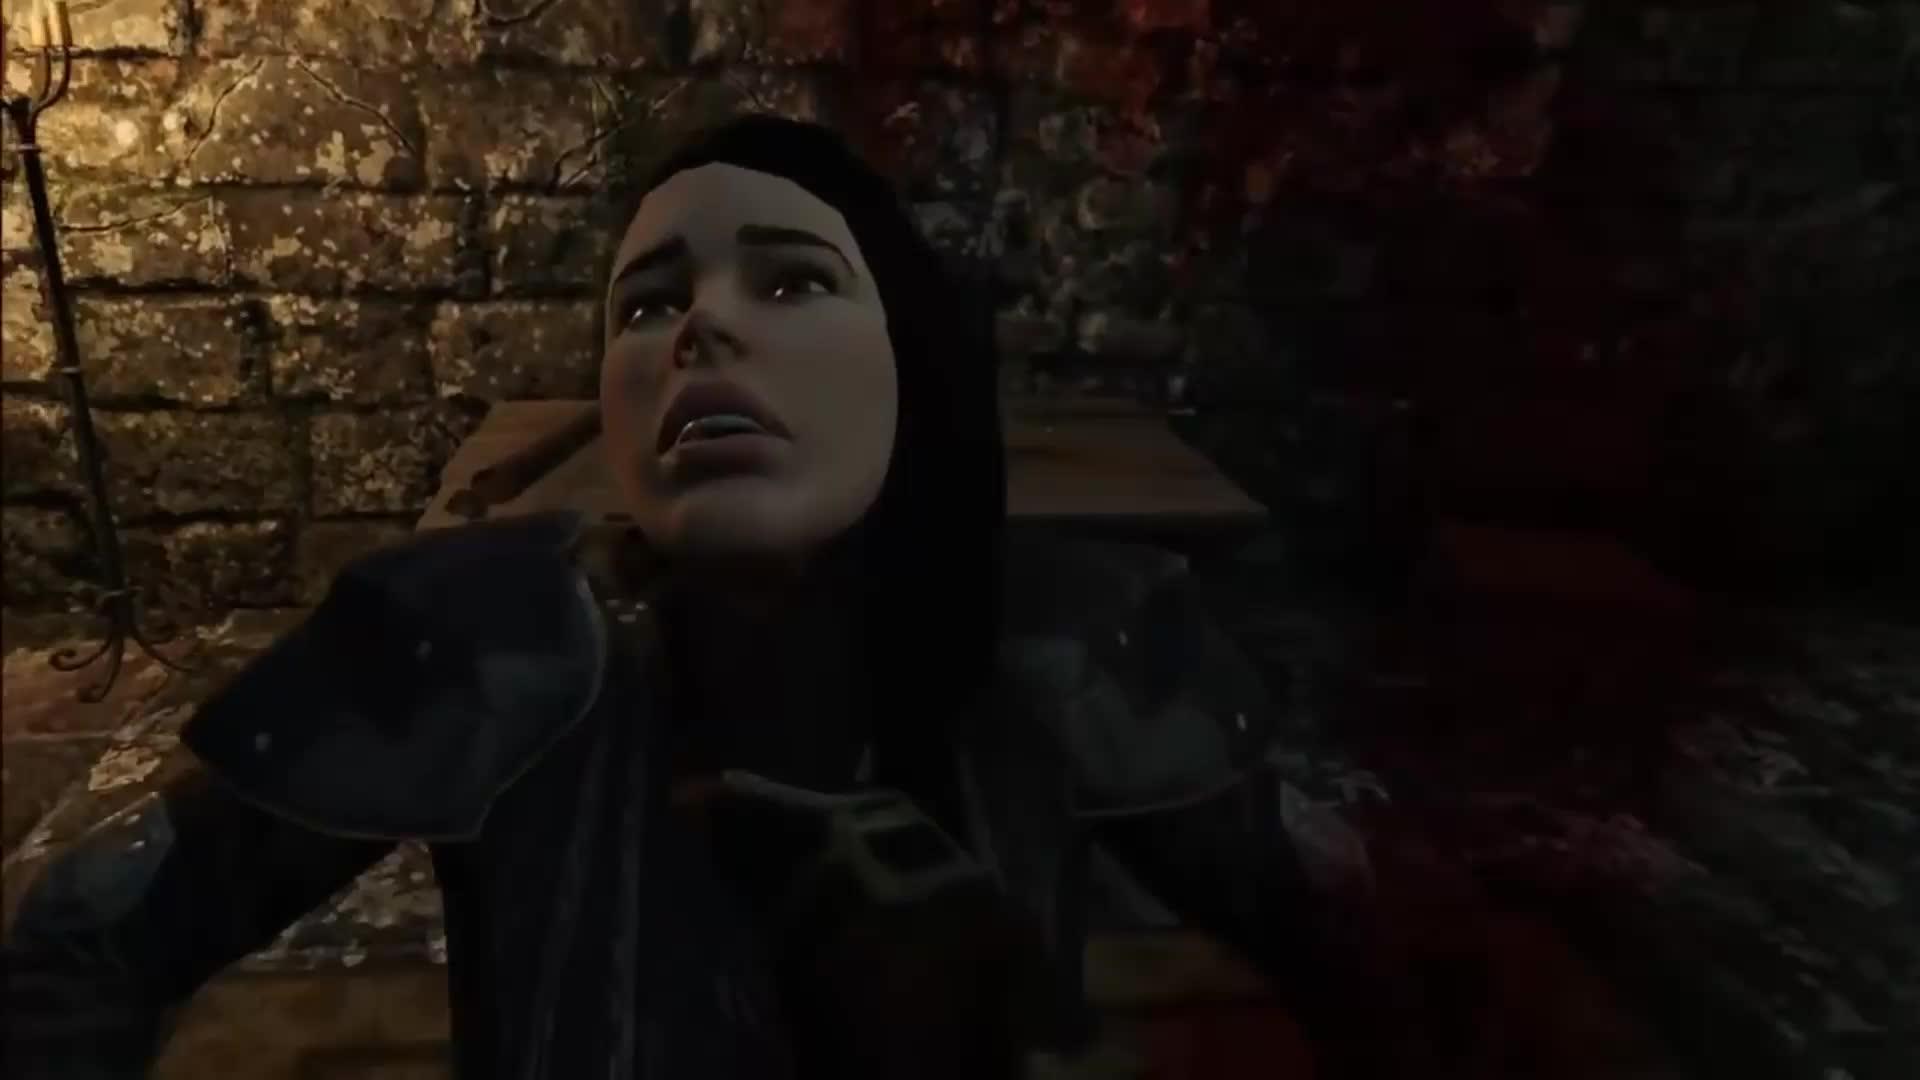 Vr Blade and Sorcery Bye Felicia Funny Oculus Rift Vive , Bye Felicia GIFs